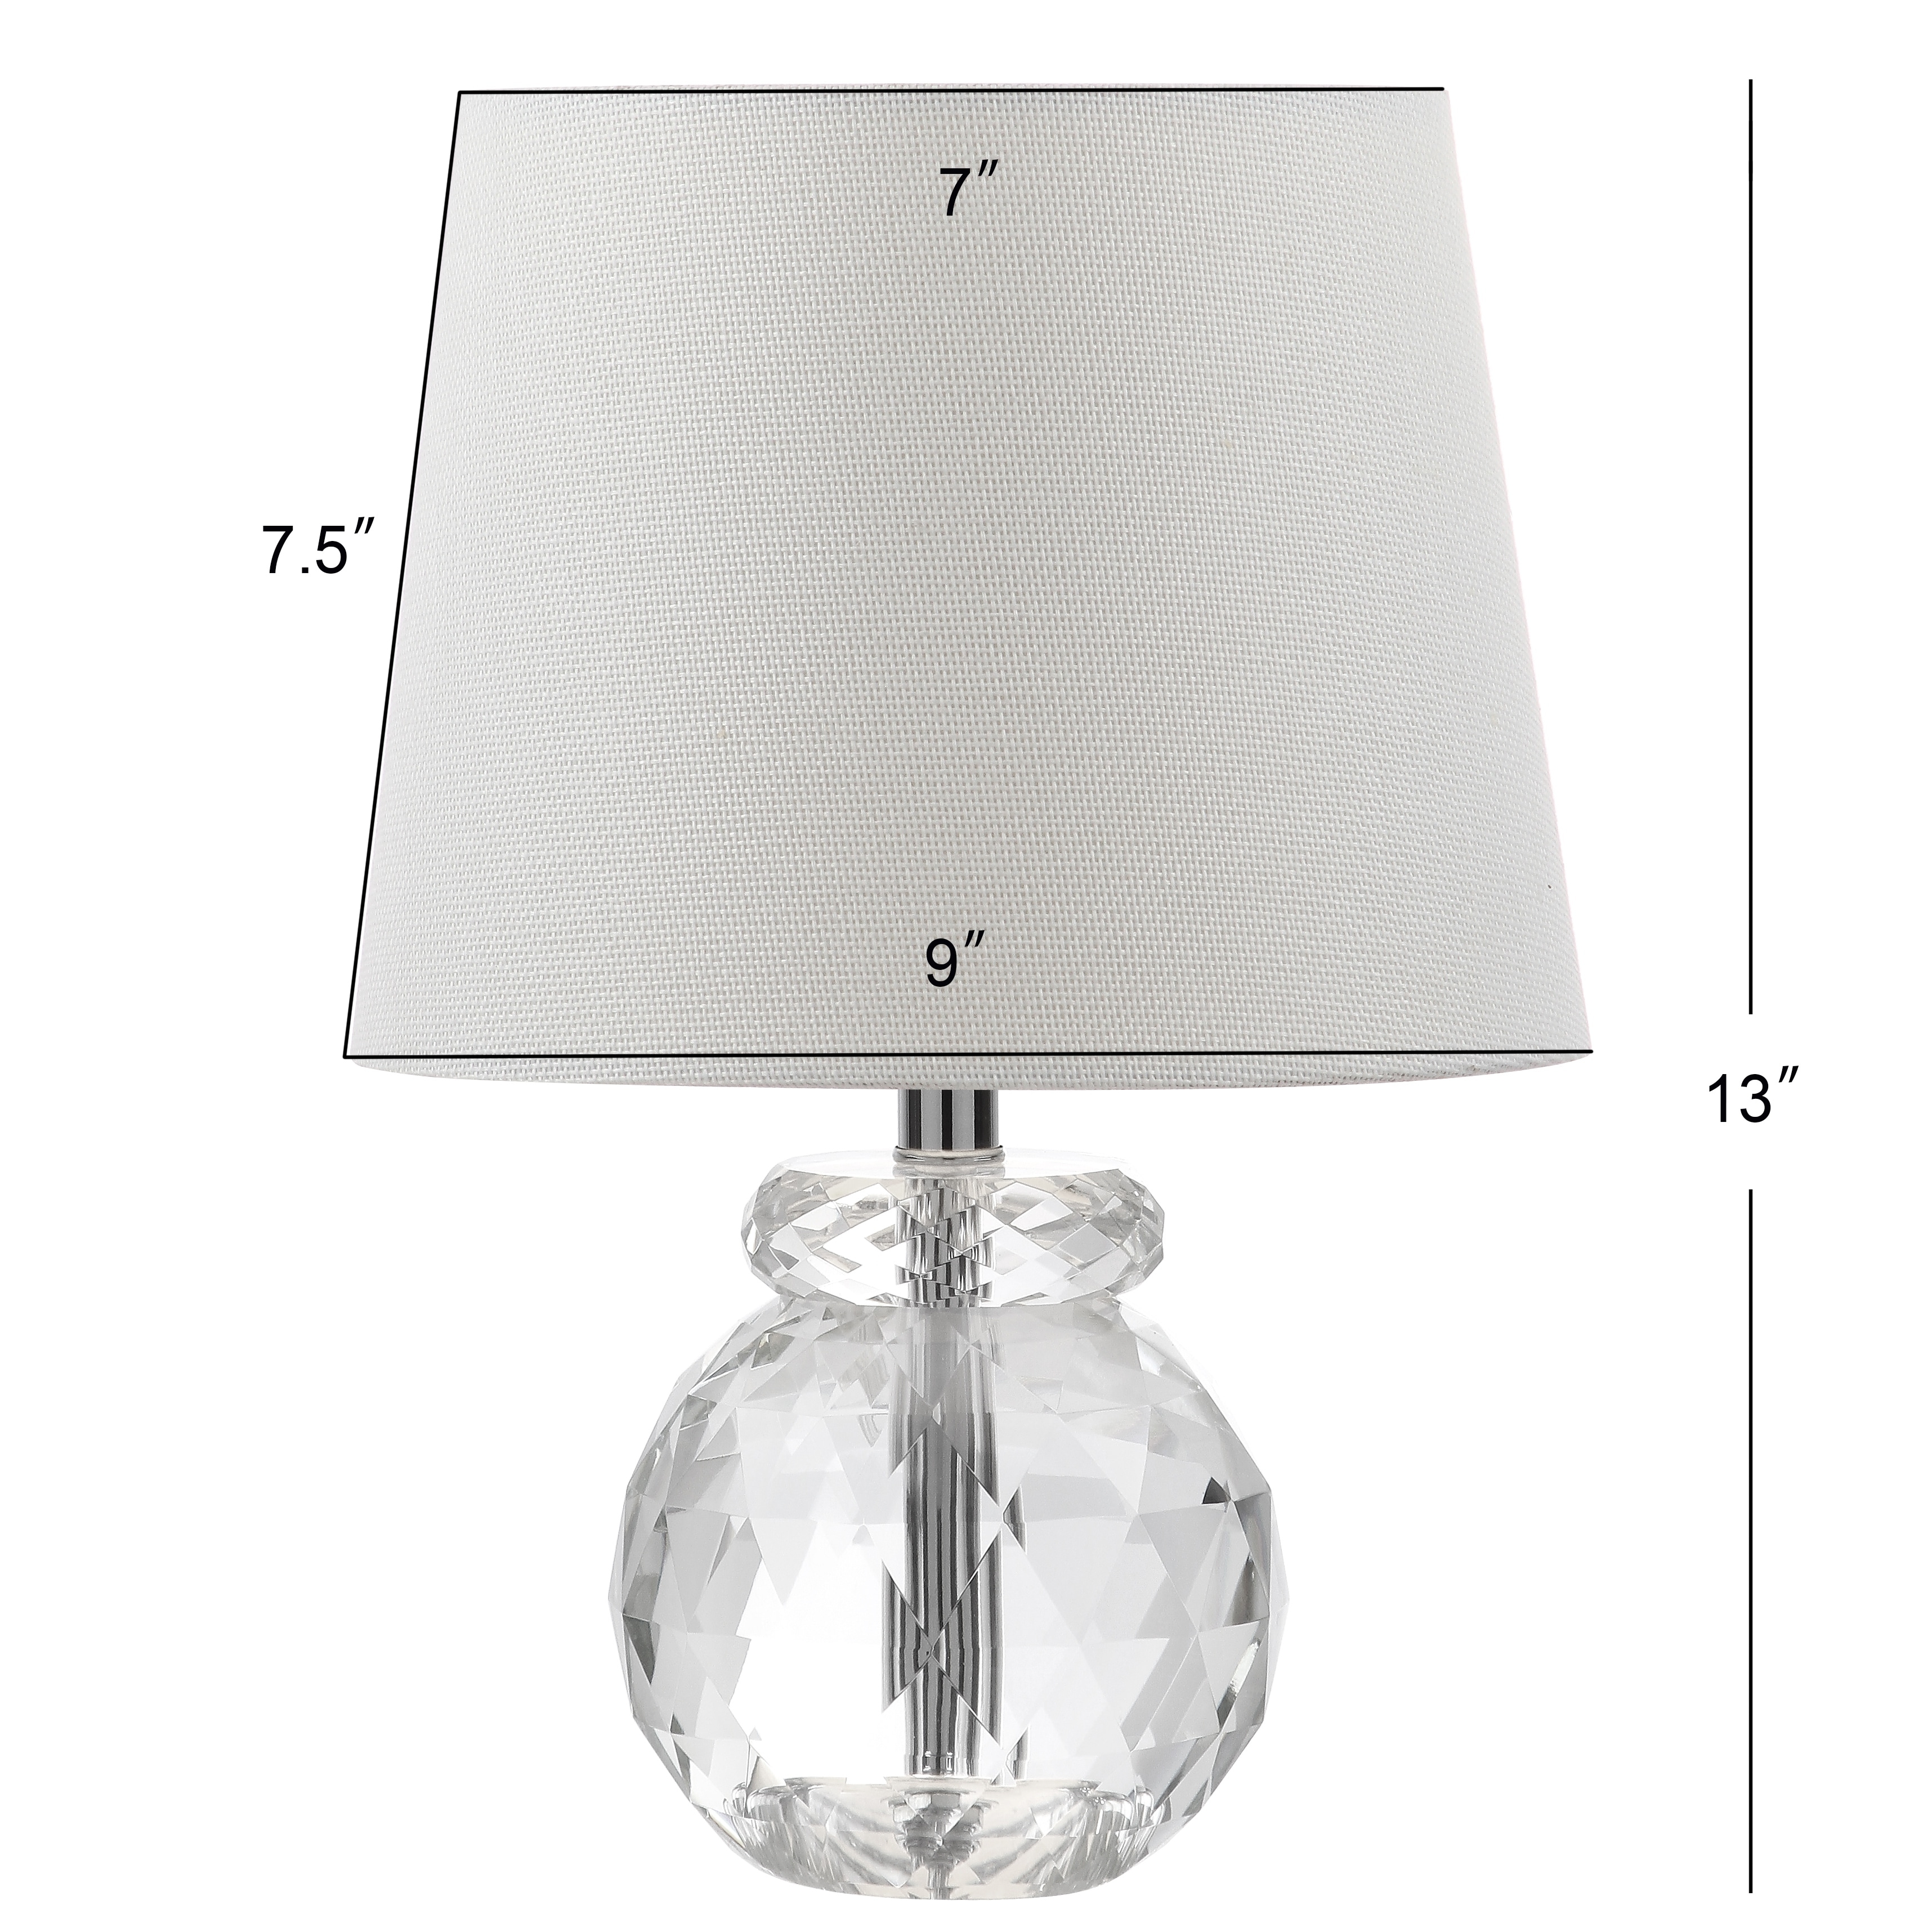 Safavieh Lighting 13 Inch Eunice Crystal Table Lamp 9 X9 X13 On Sale Overstock 13434432